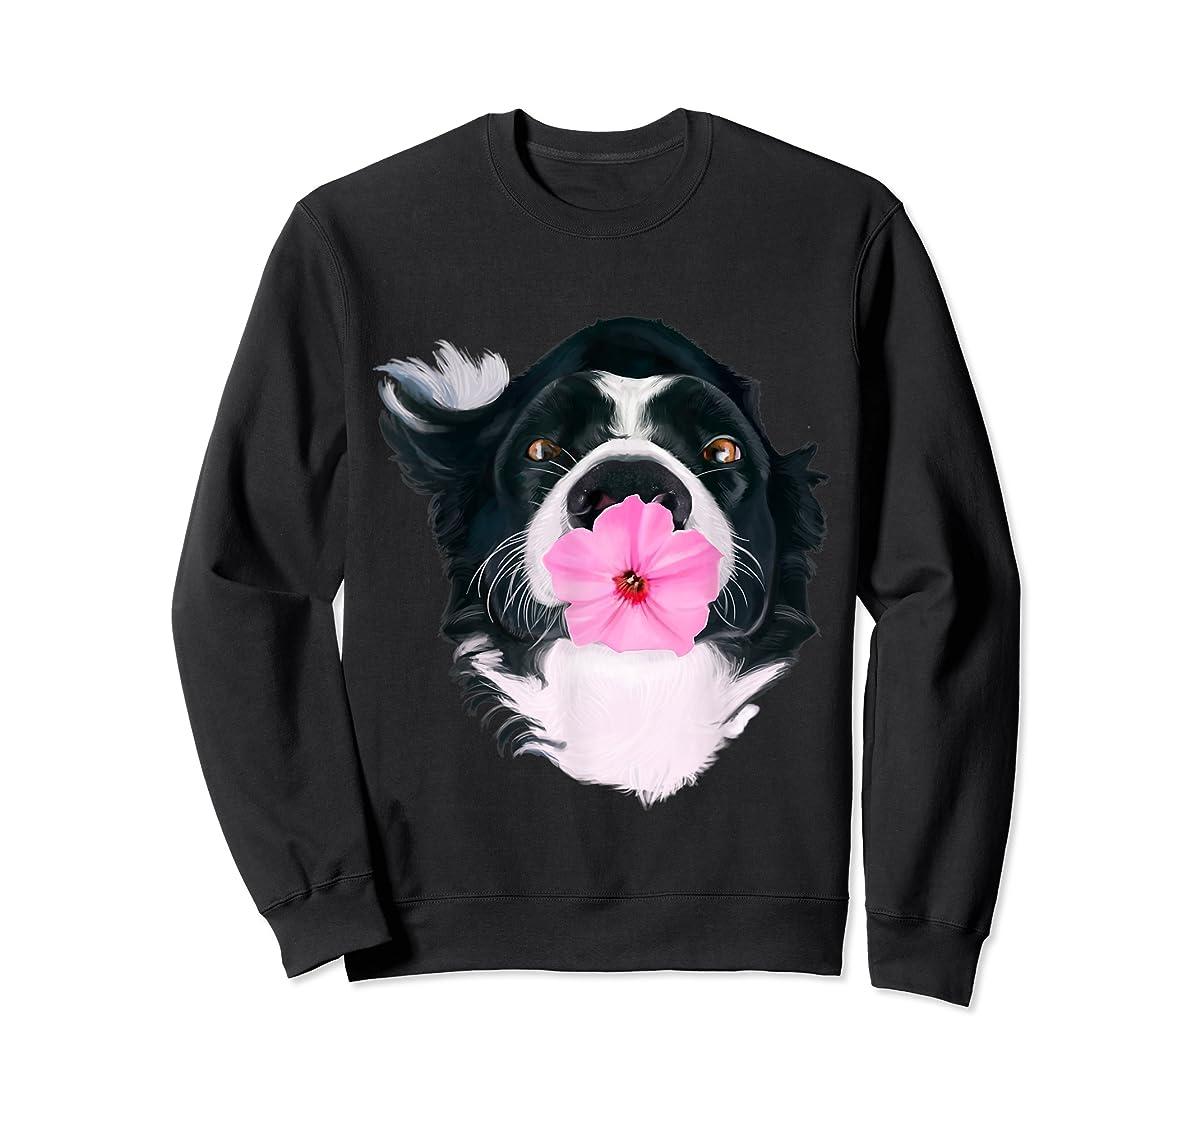 Border Collie Sweet Dog T-Shirt Dogs Tee Shirt Gifts-Sweatshirt-Black